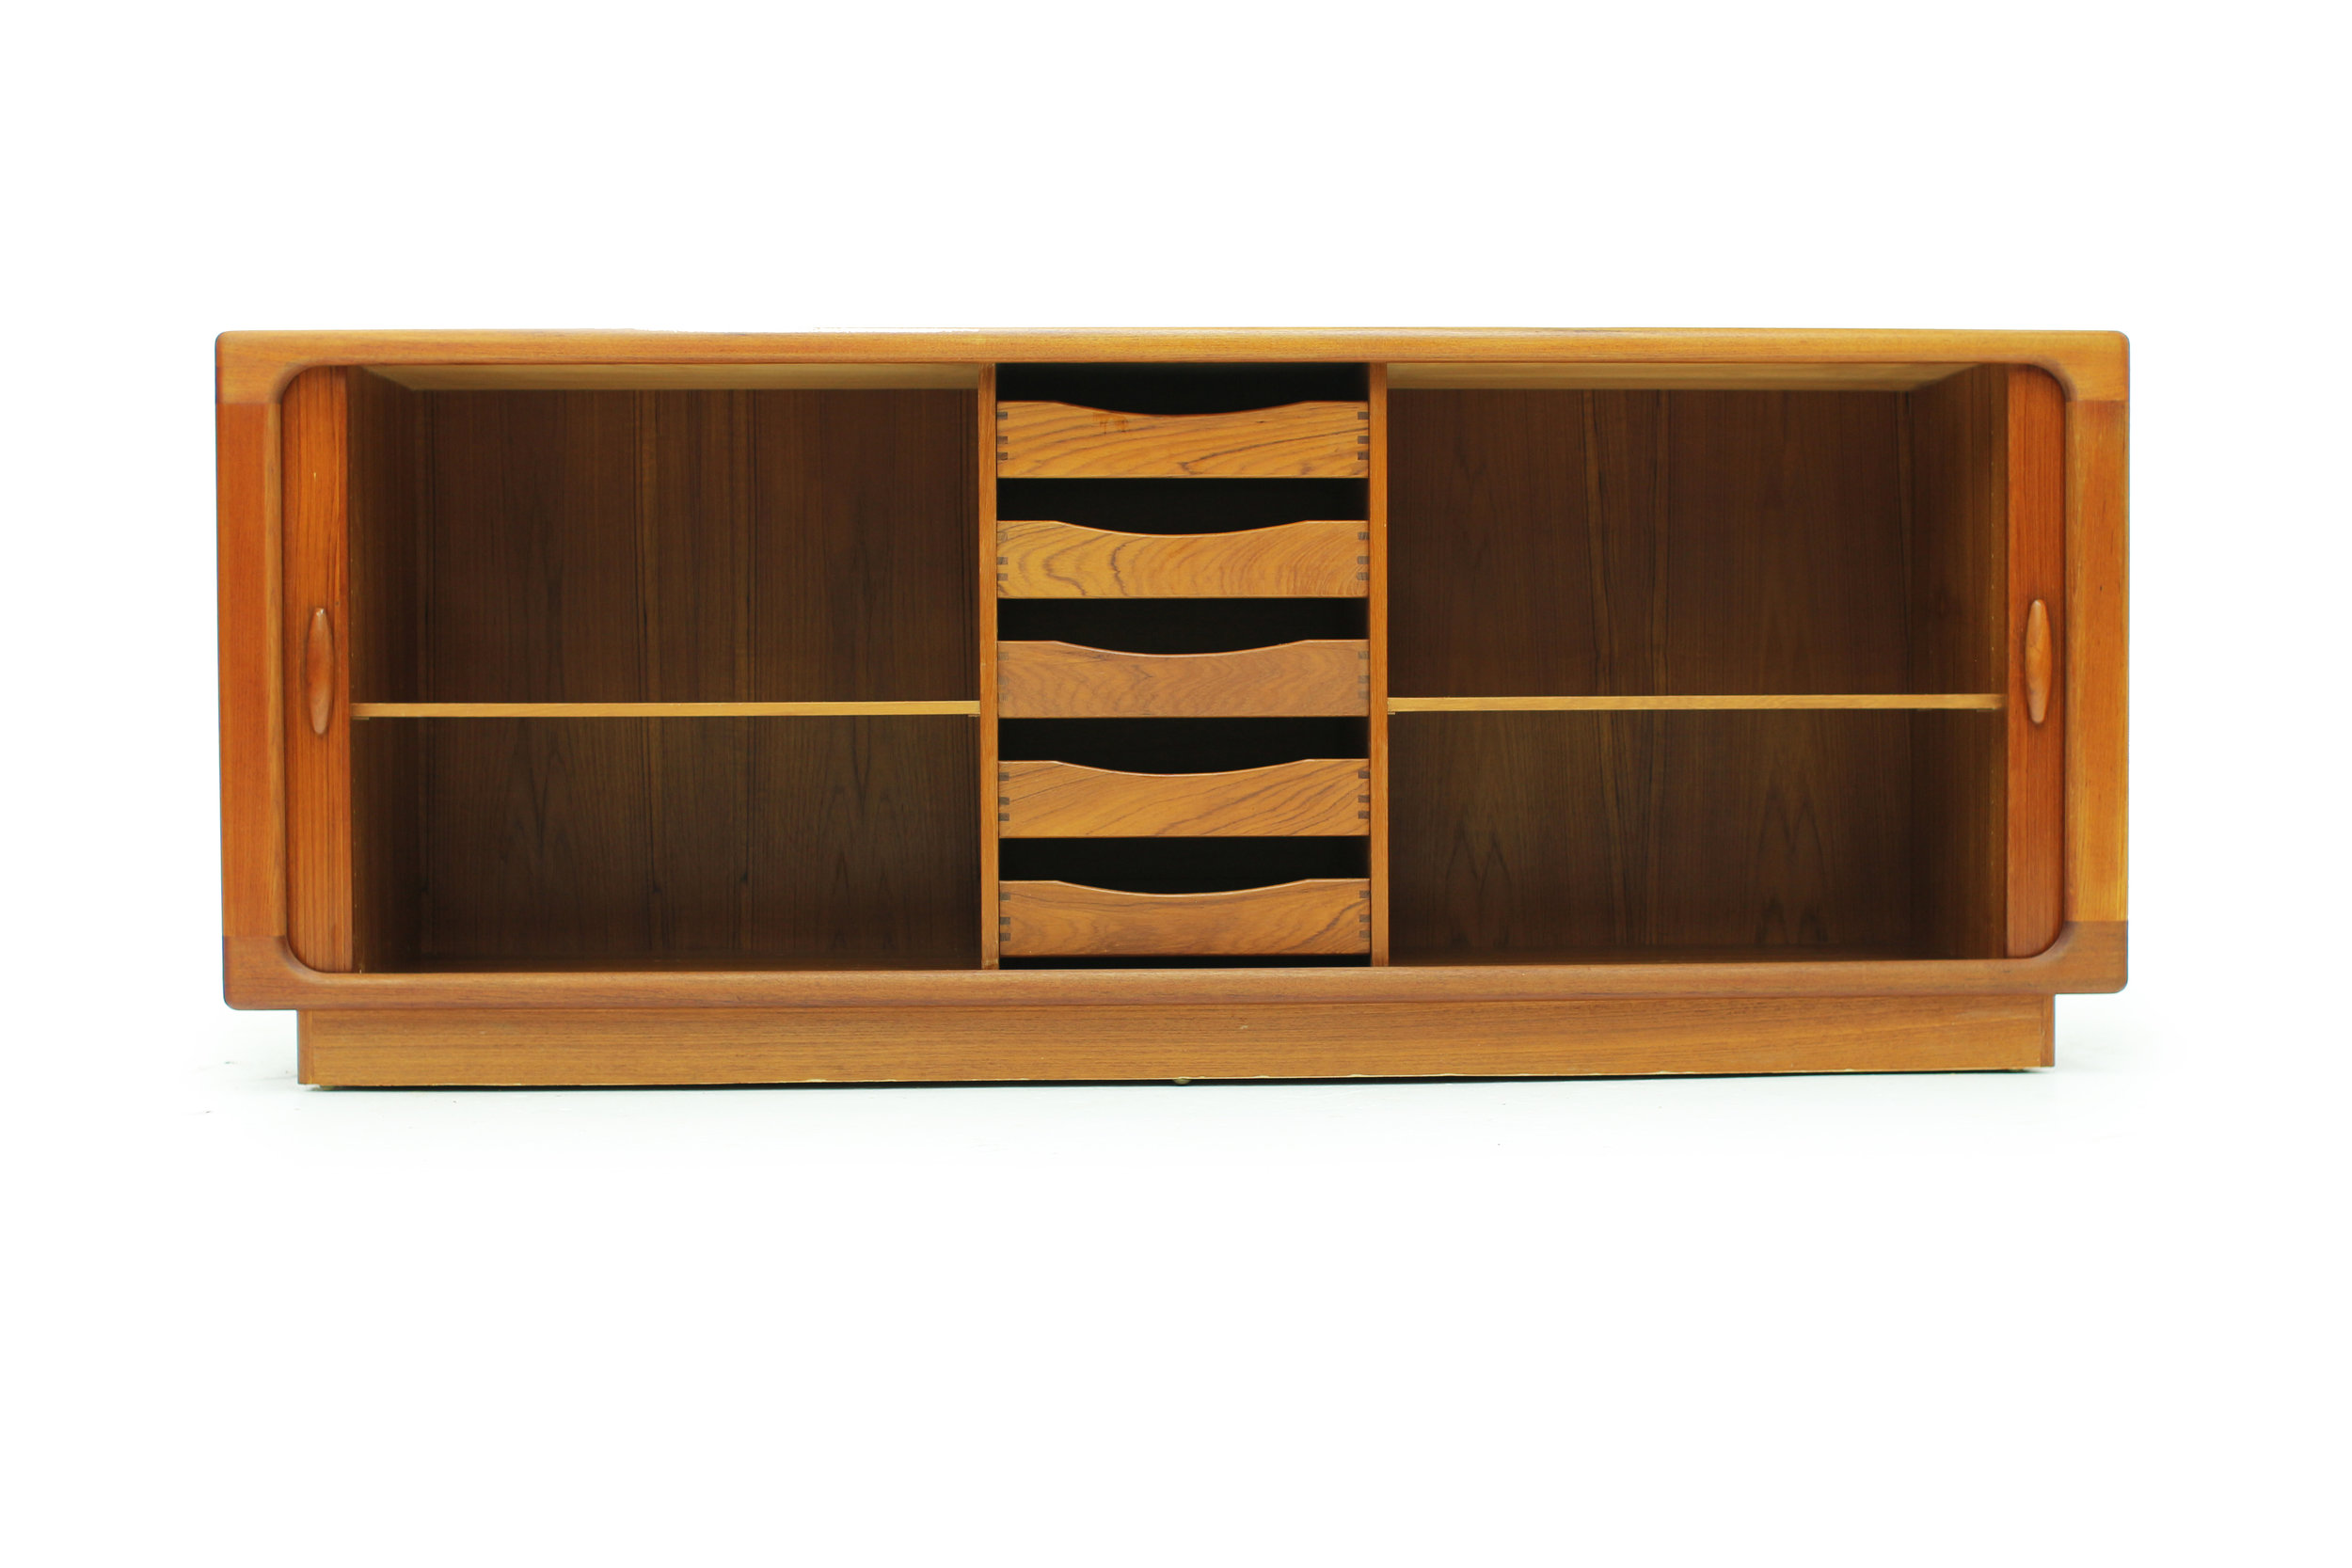 Danish Teak Sideboard with Tambour Doors Made by Dyrlund (6).jpg